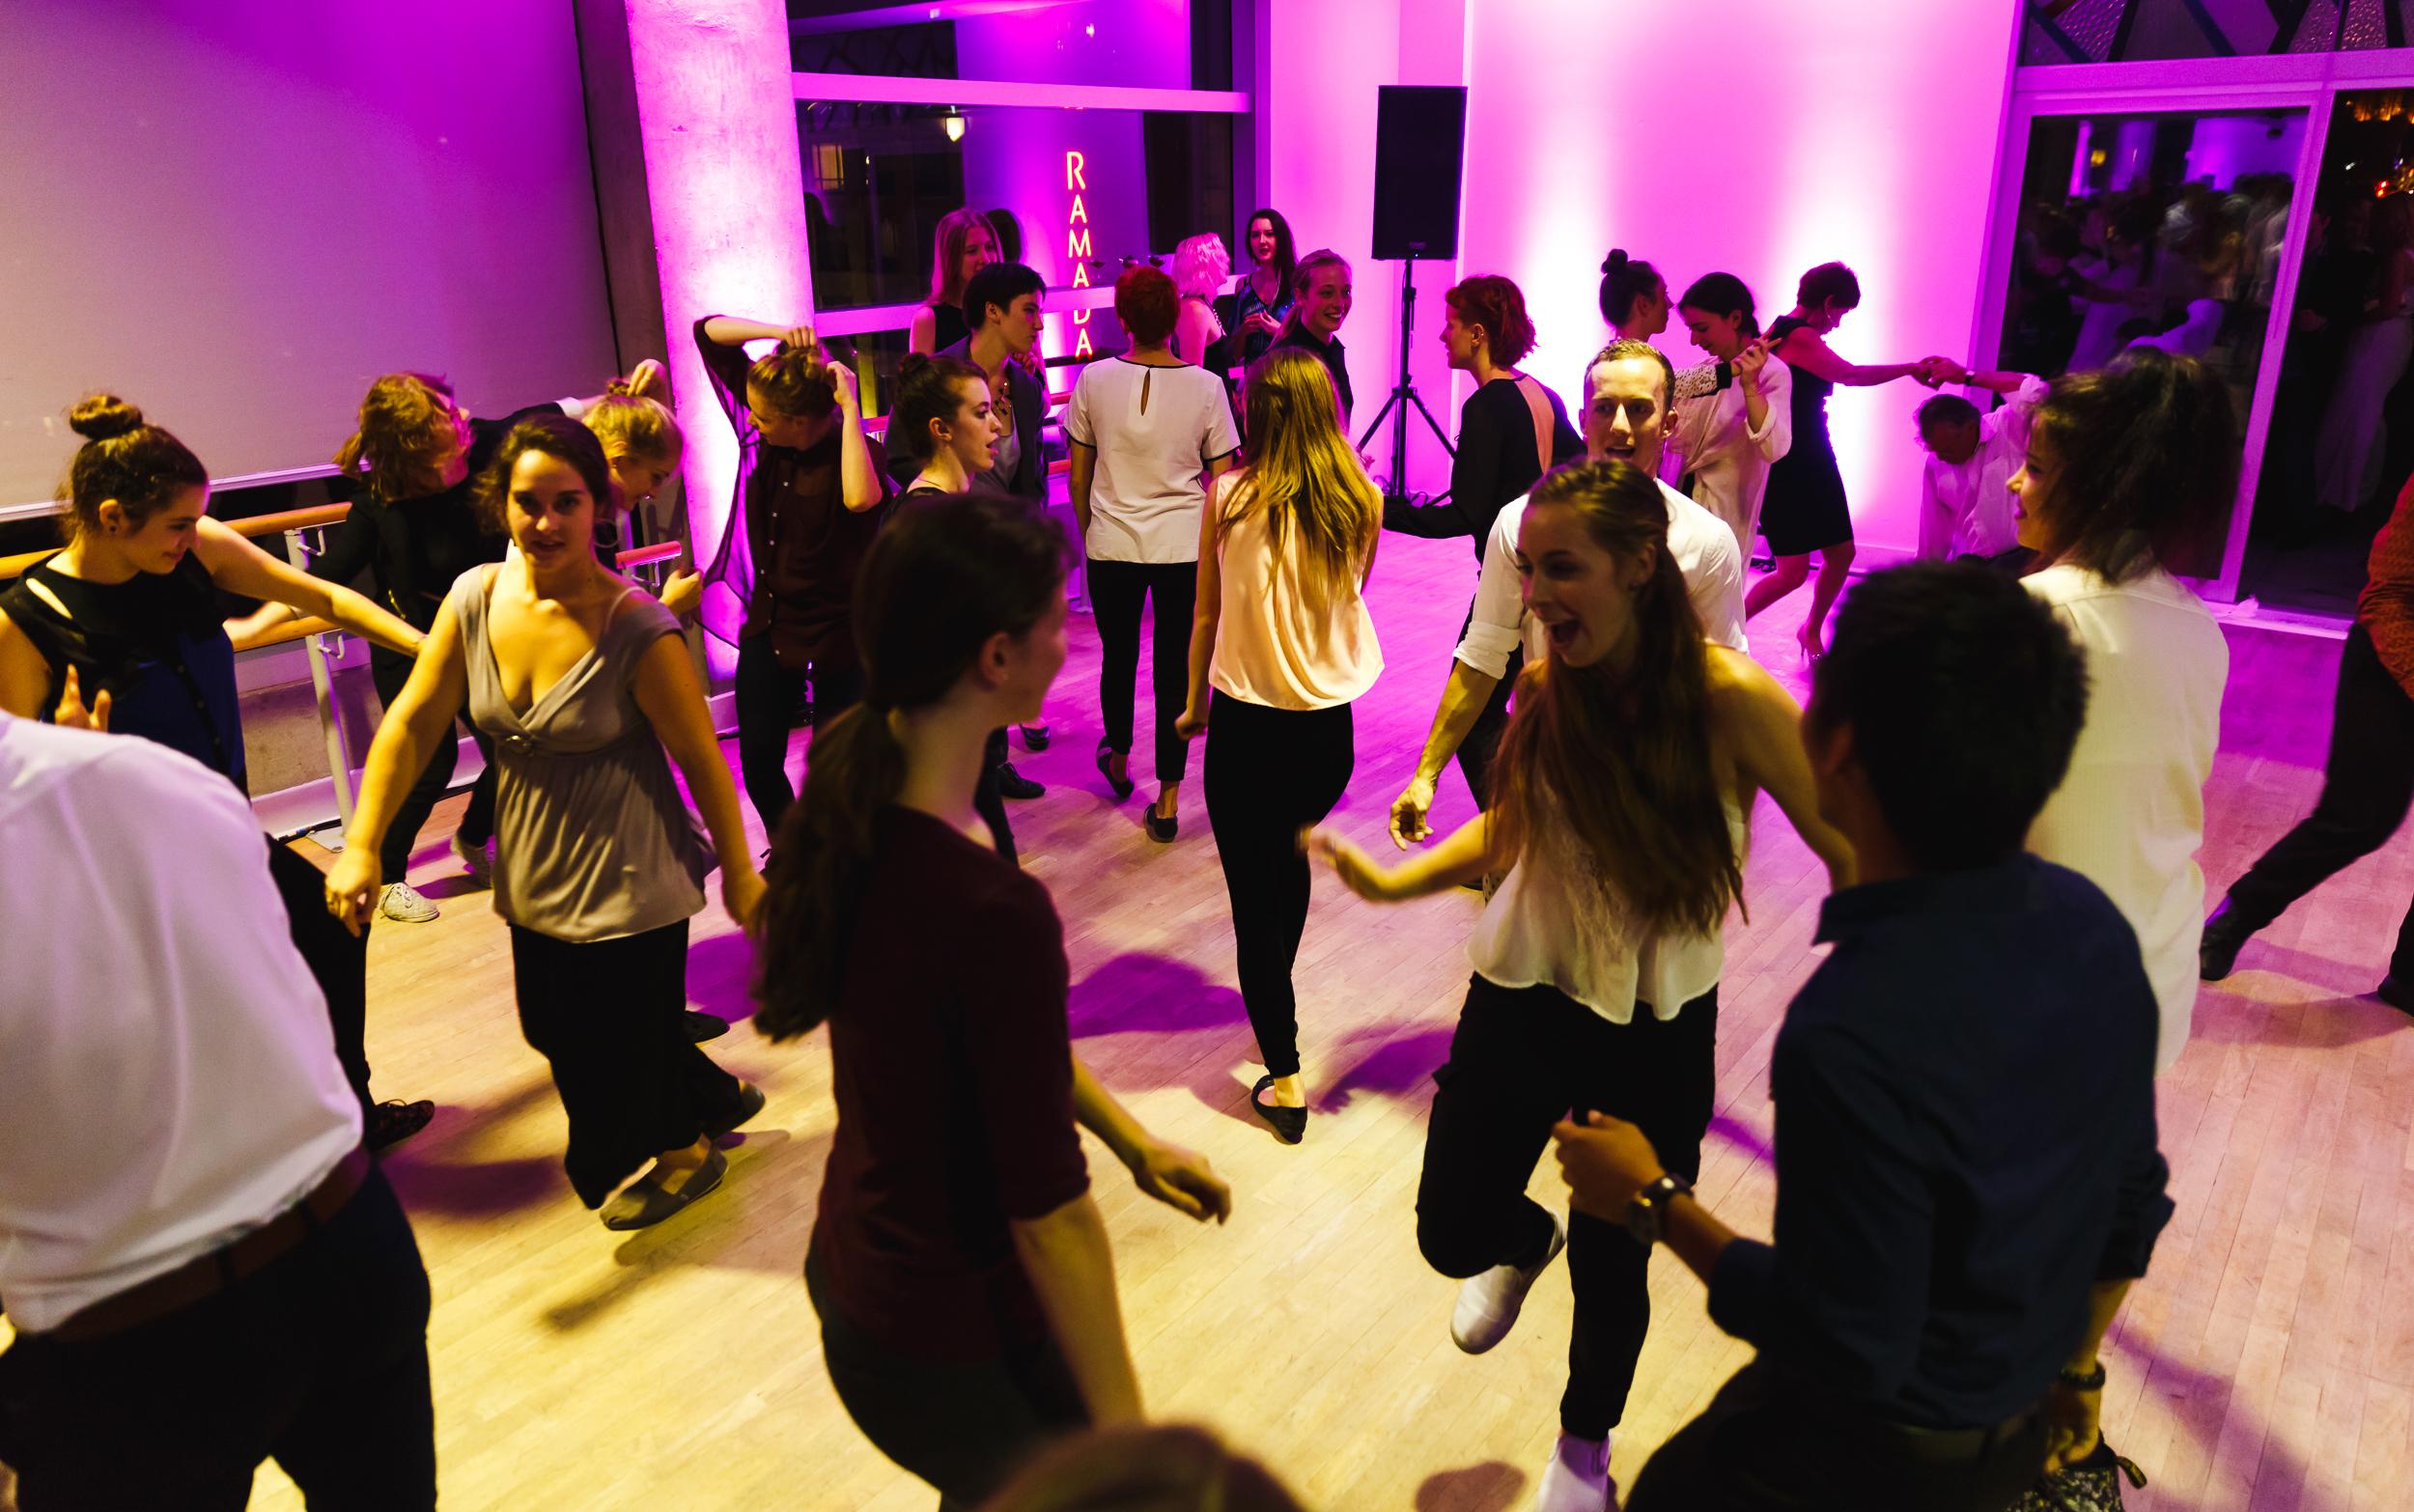 Scotiabank-Dance-Hotel-image21.jpg